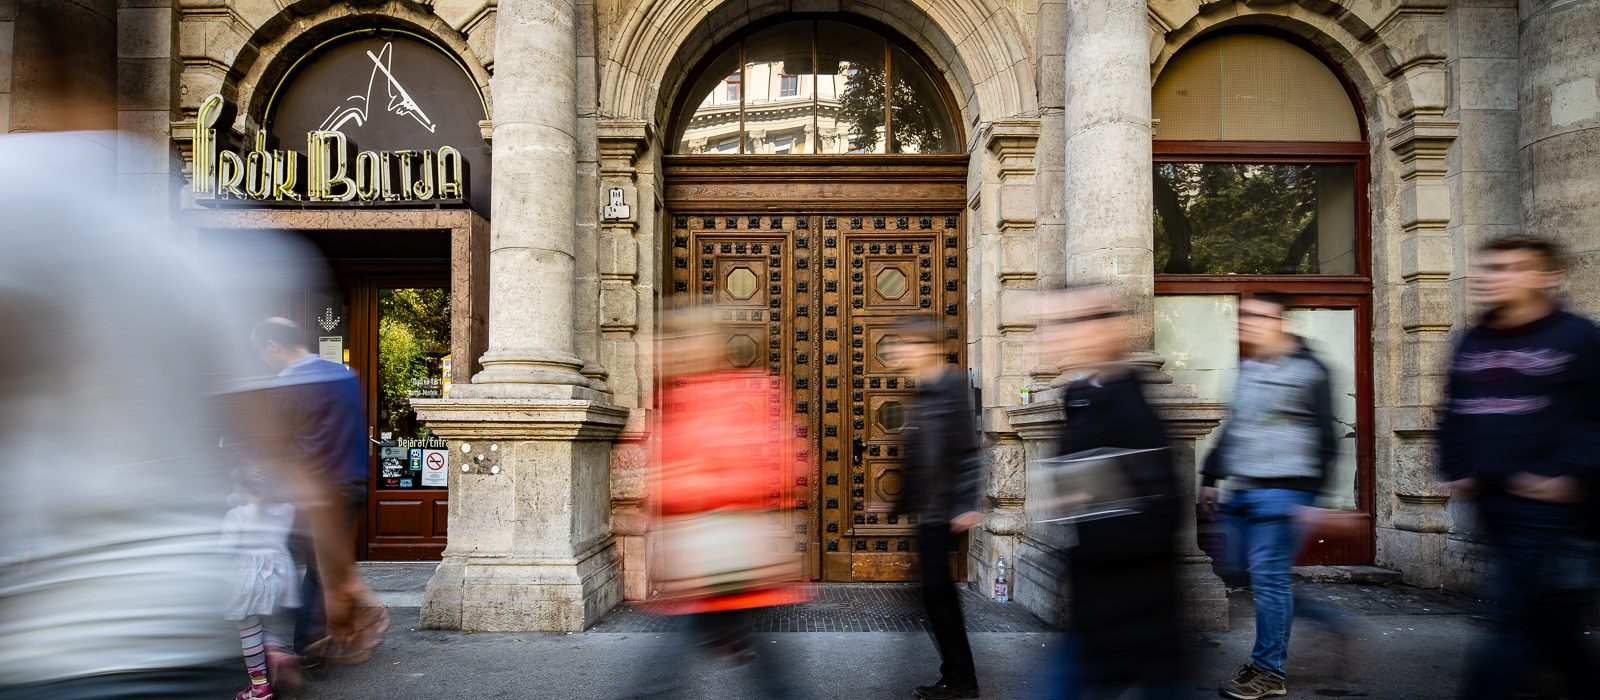 #fotomontag #210 | City Life | Norbert Eder